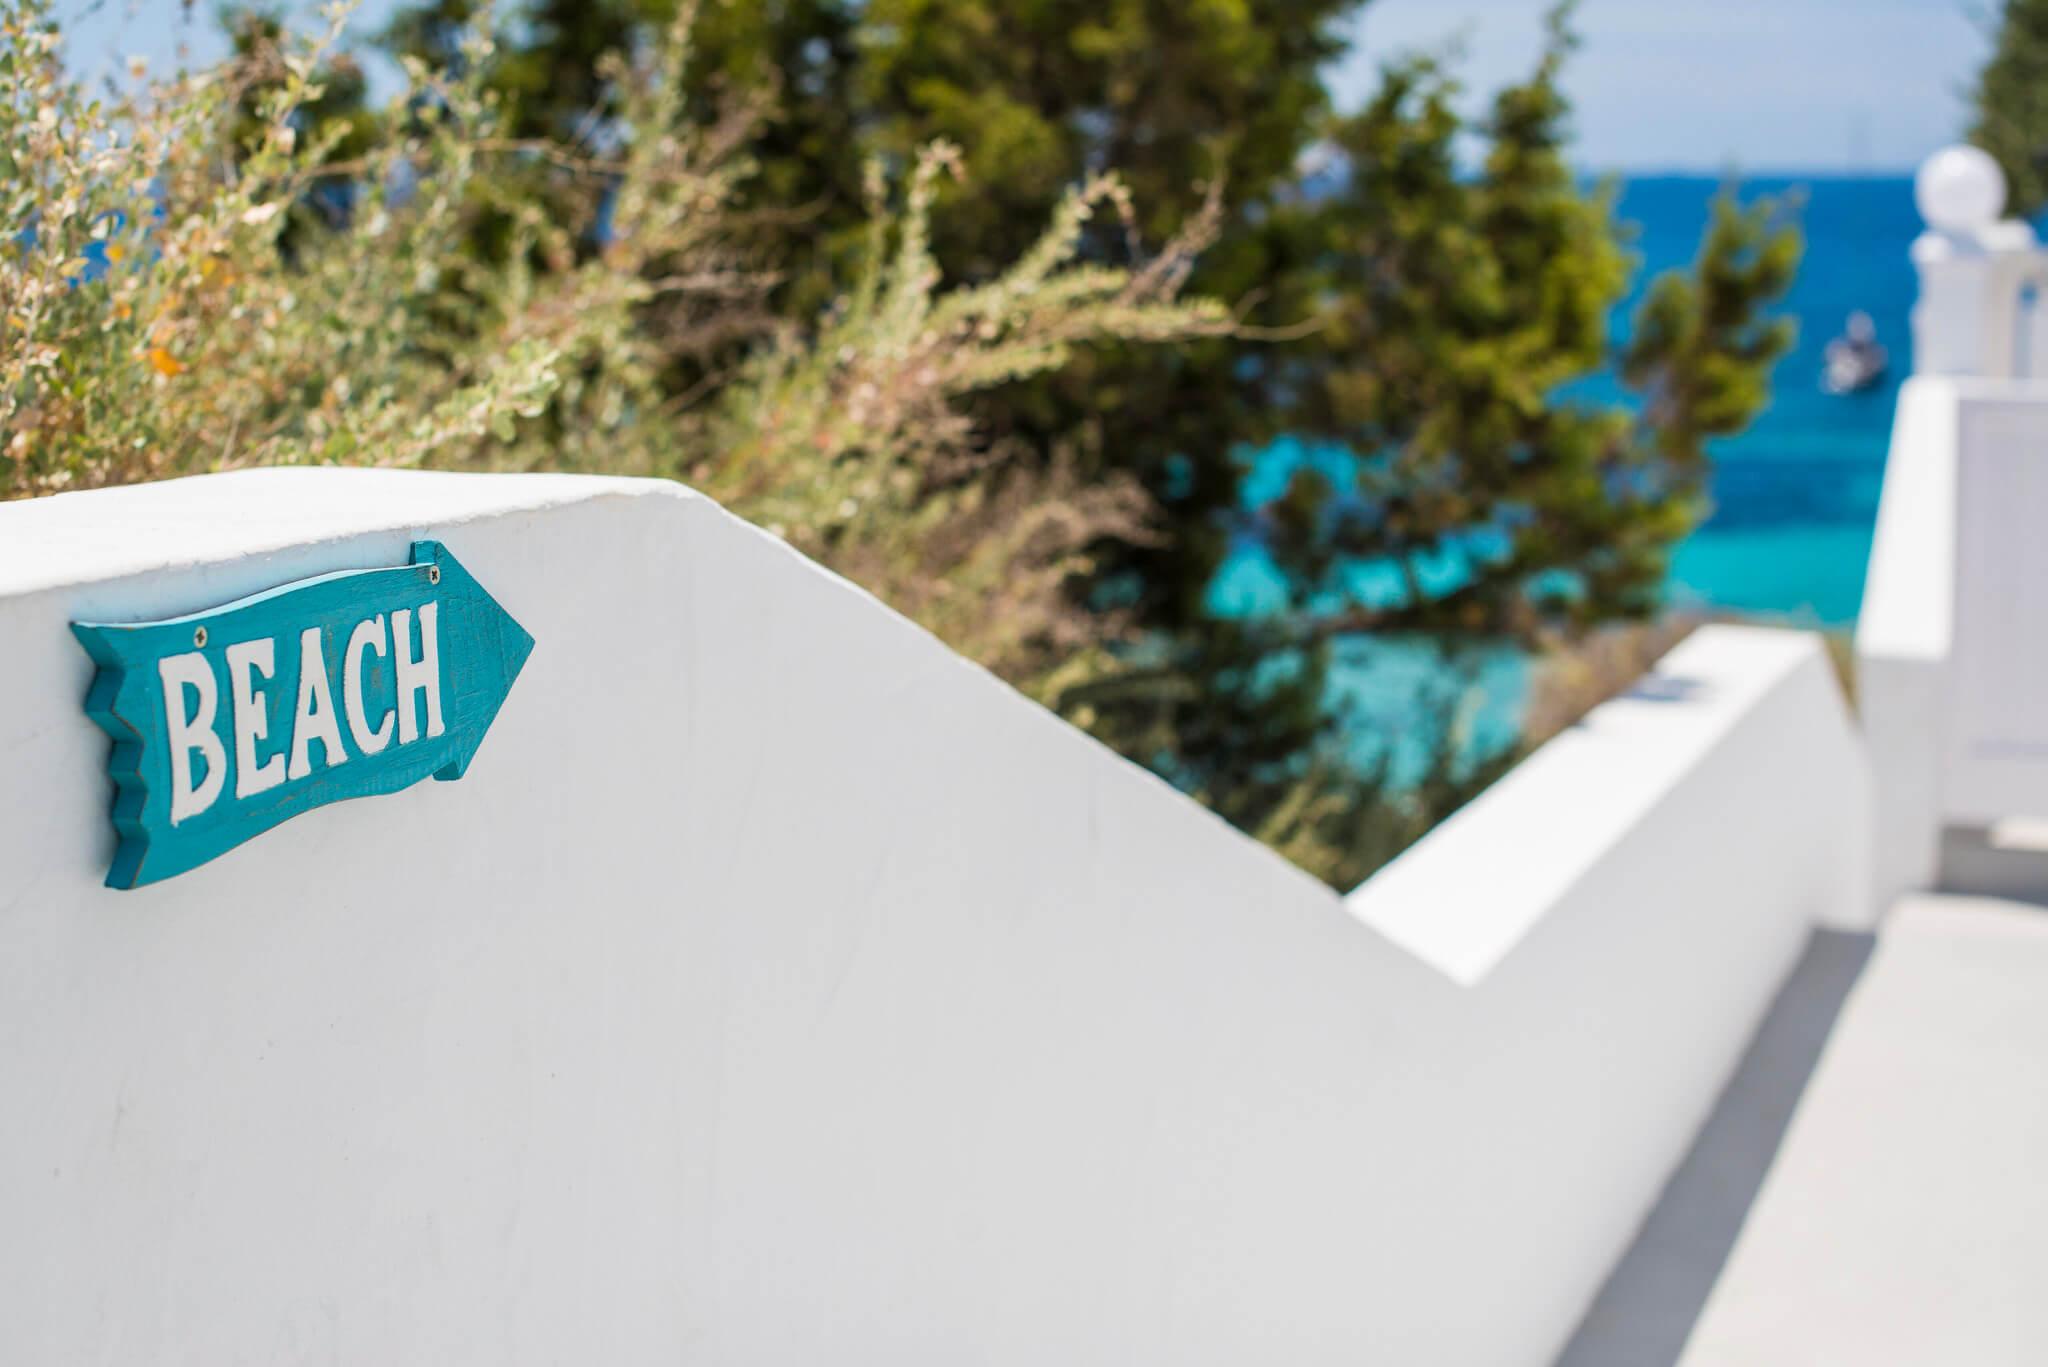 https://www.white-ibiza.com/wp-content/uploads/2020/03/ibiza-beach-restaurant-cotton-beach-club-2020-07.jpg